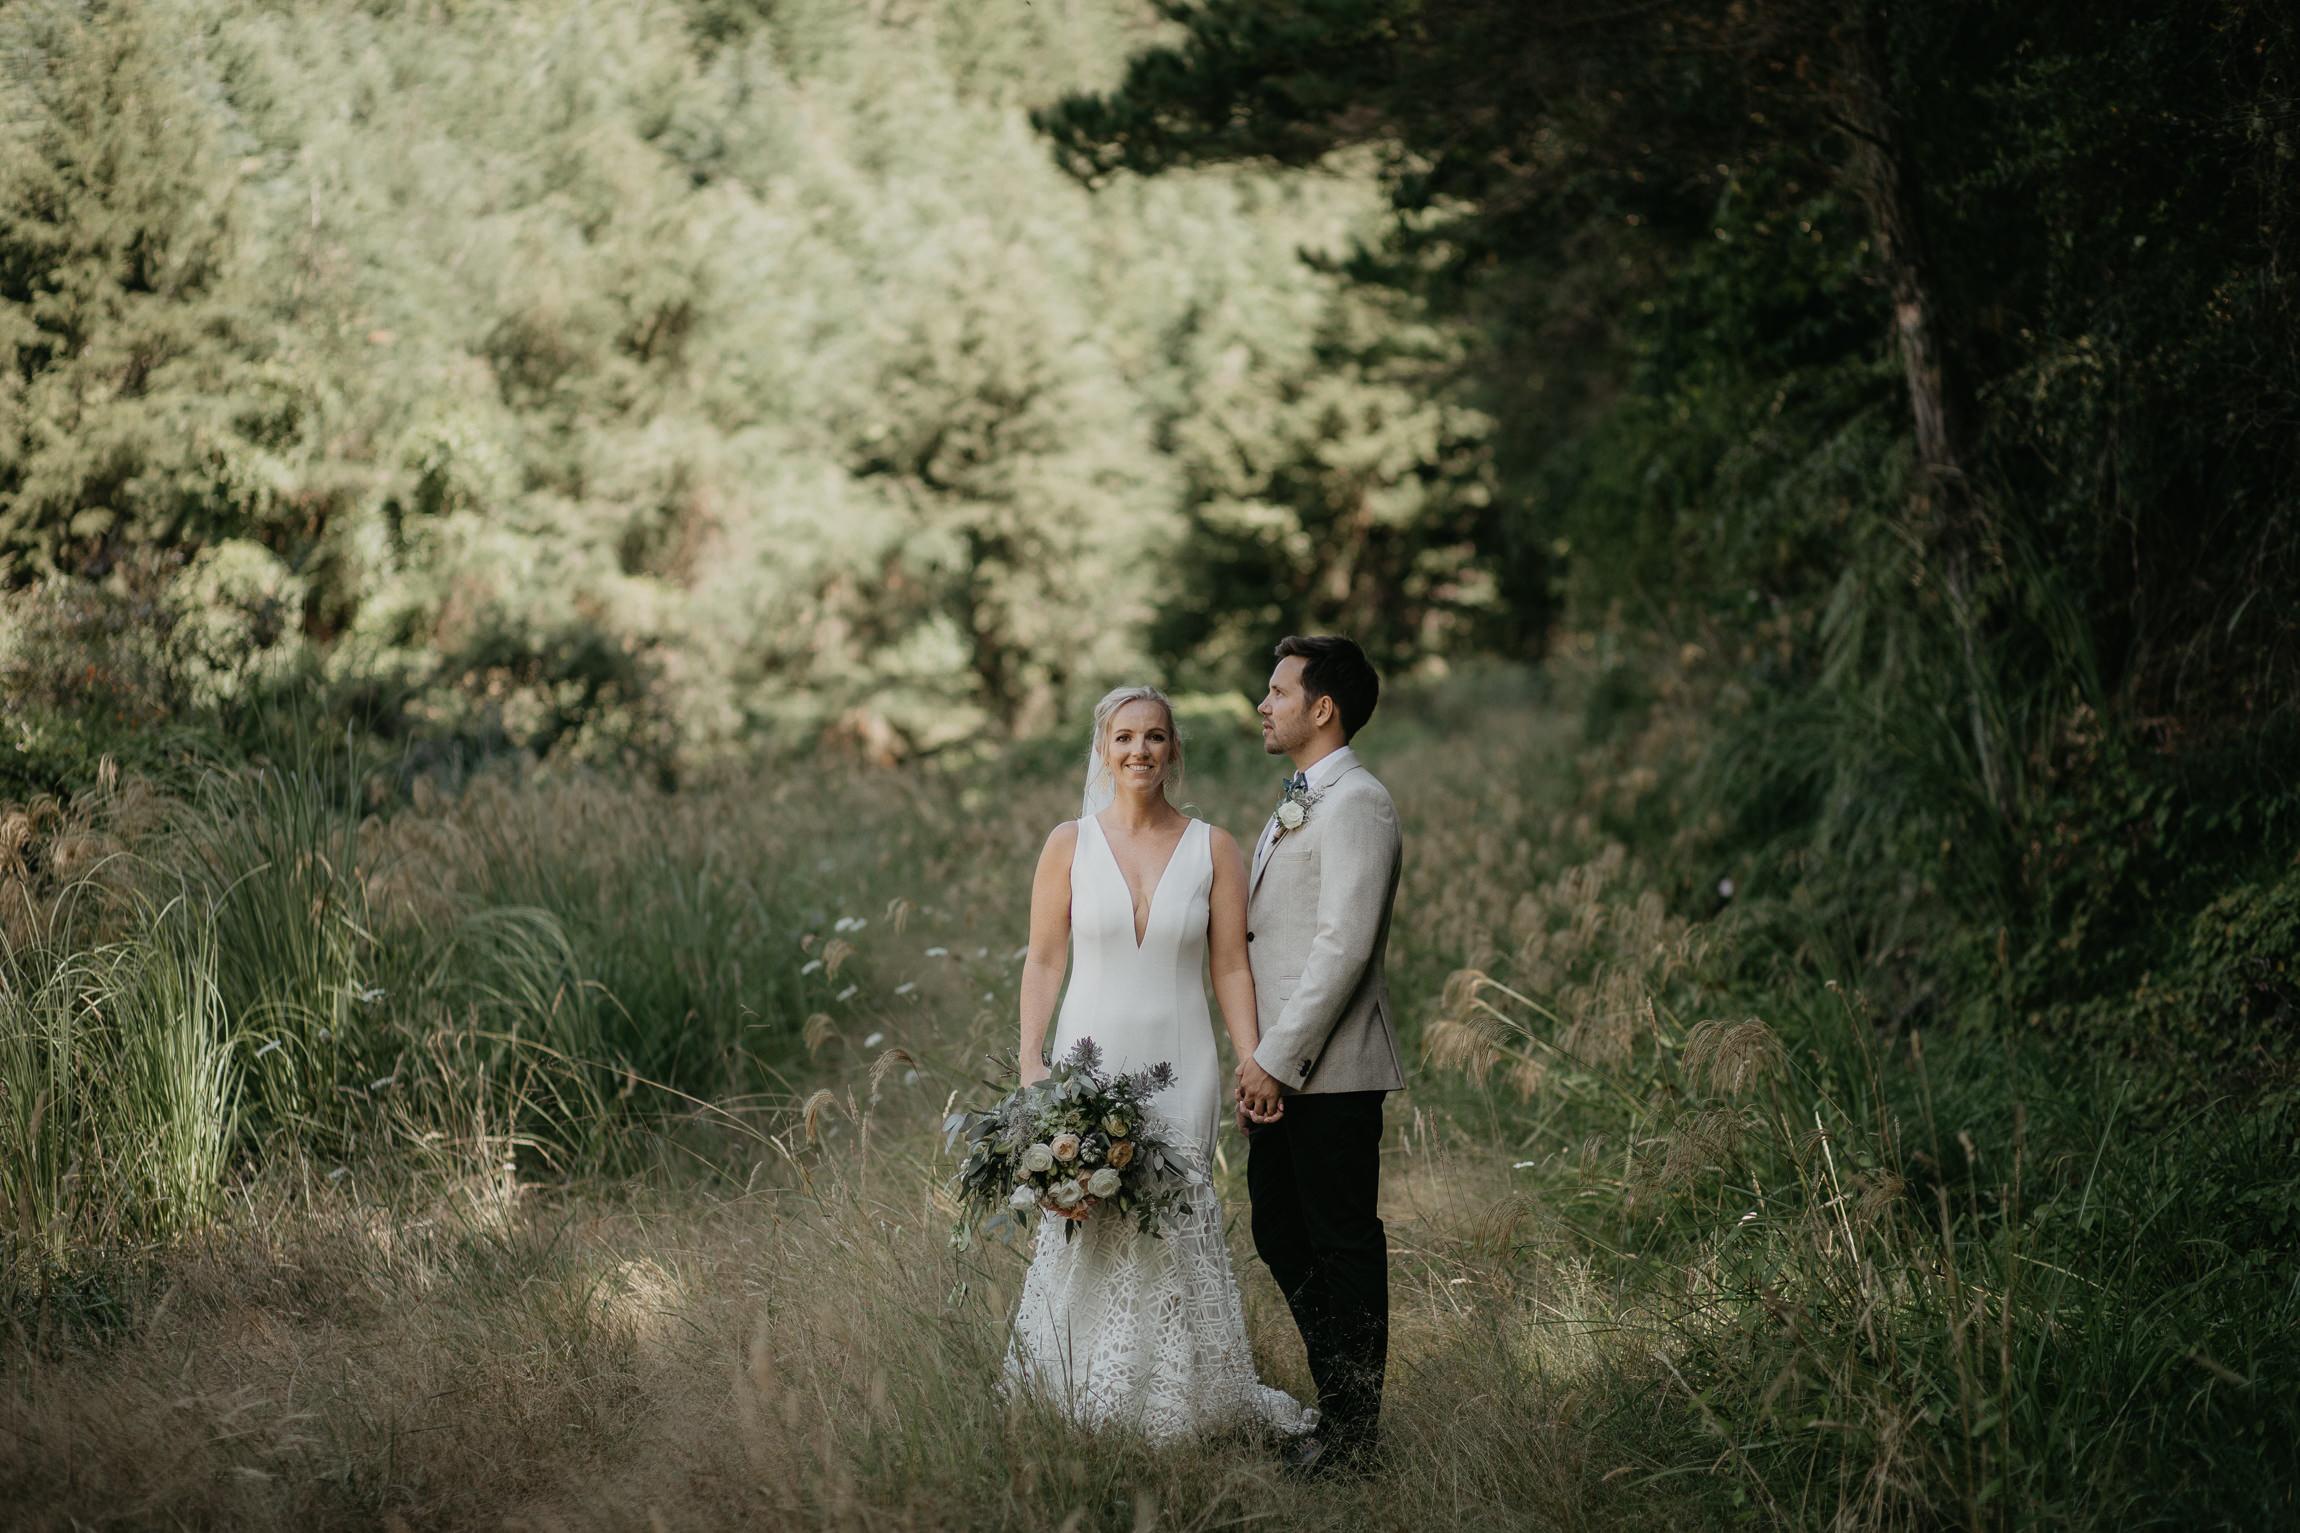 oldforestschool-wedding-blog-80.jpg